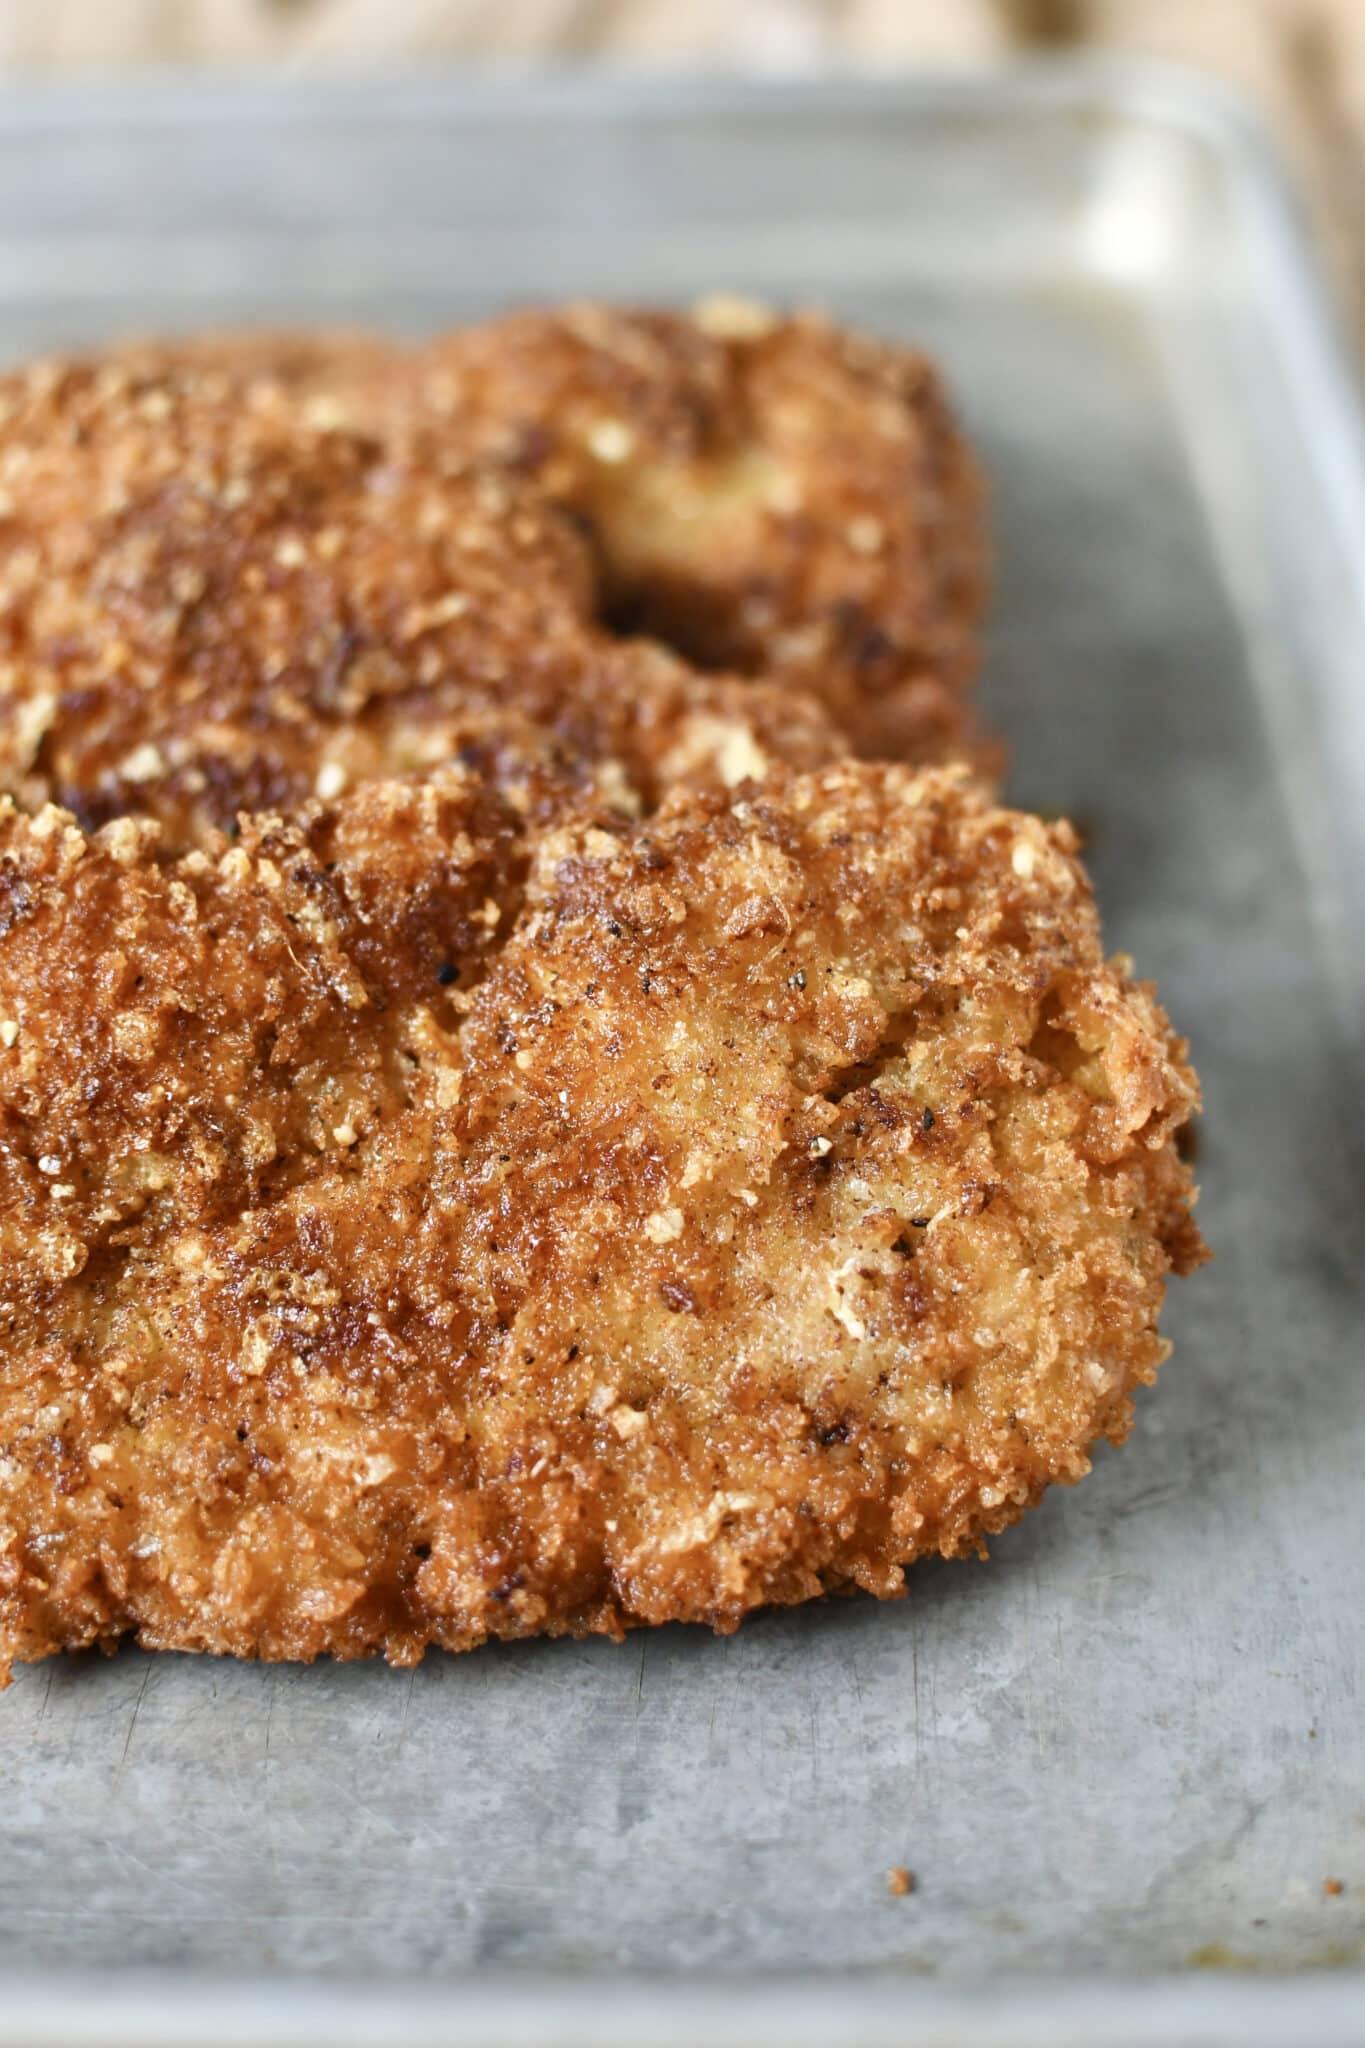 Crispy Parmesan Chicken, after frying.